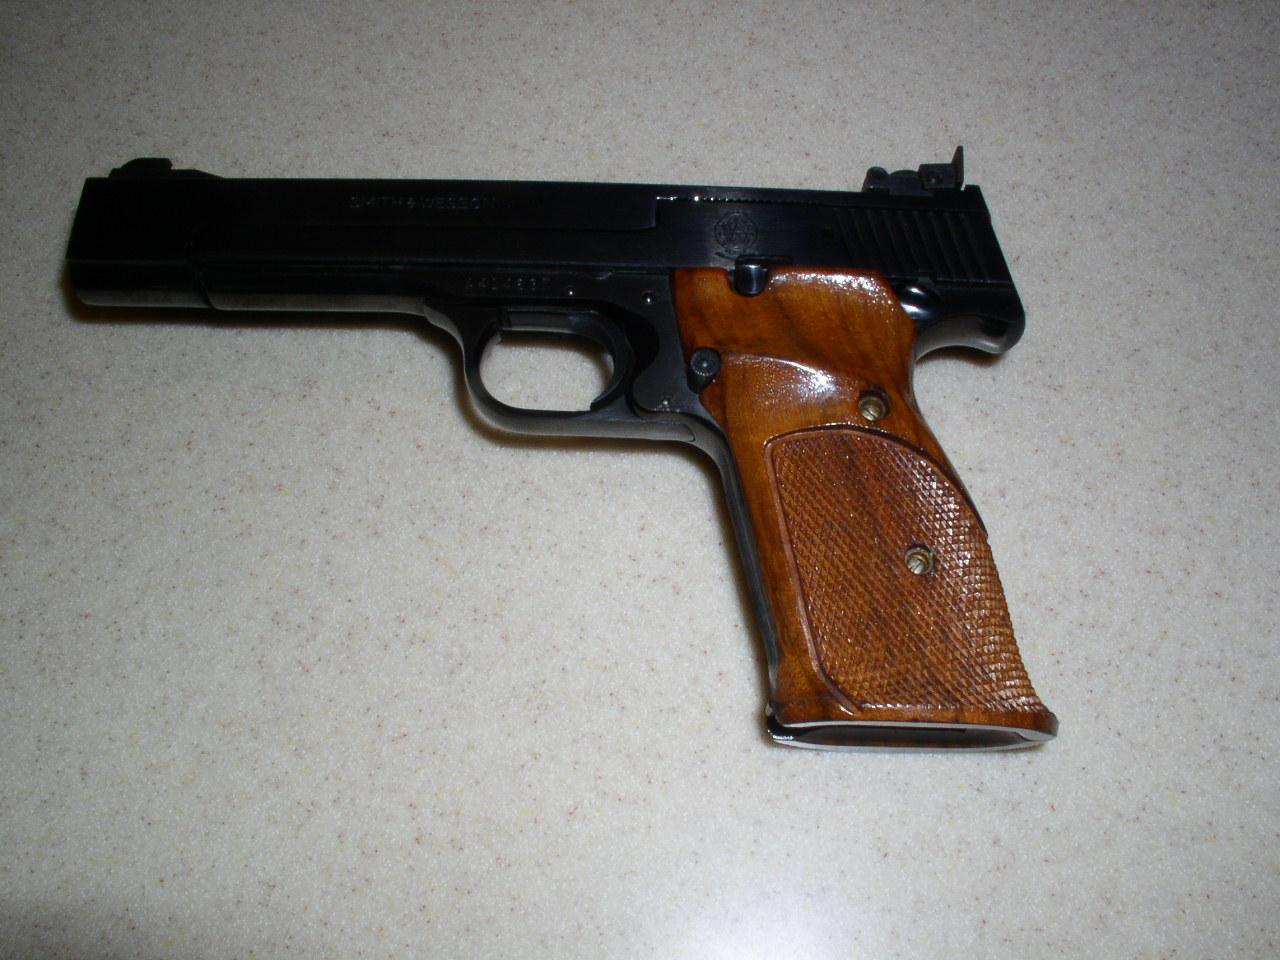 New old target pistol-p1010195.jpg